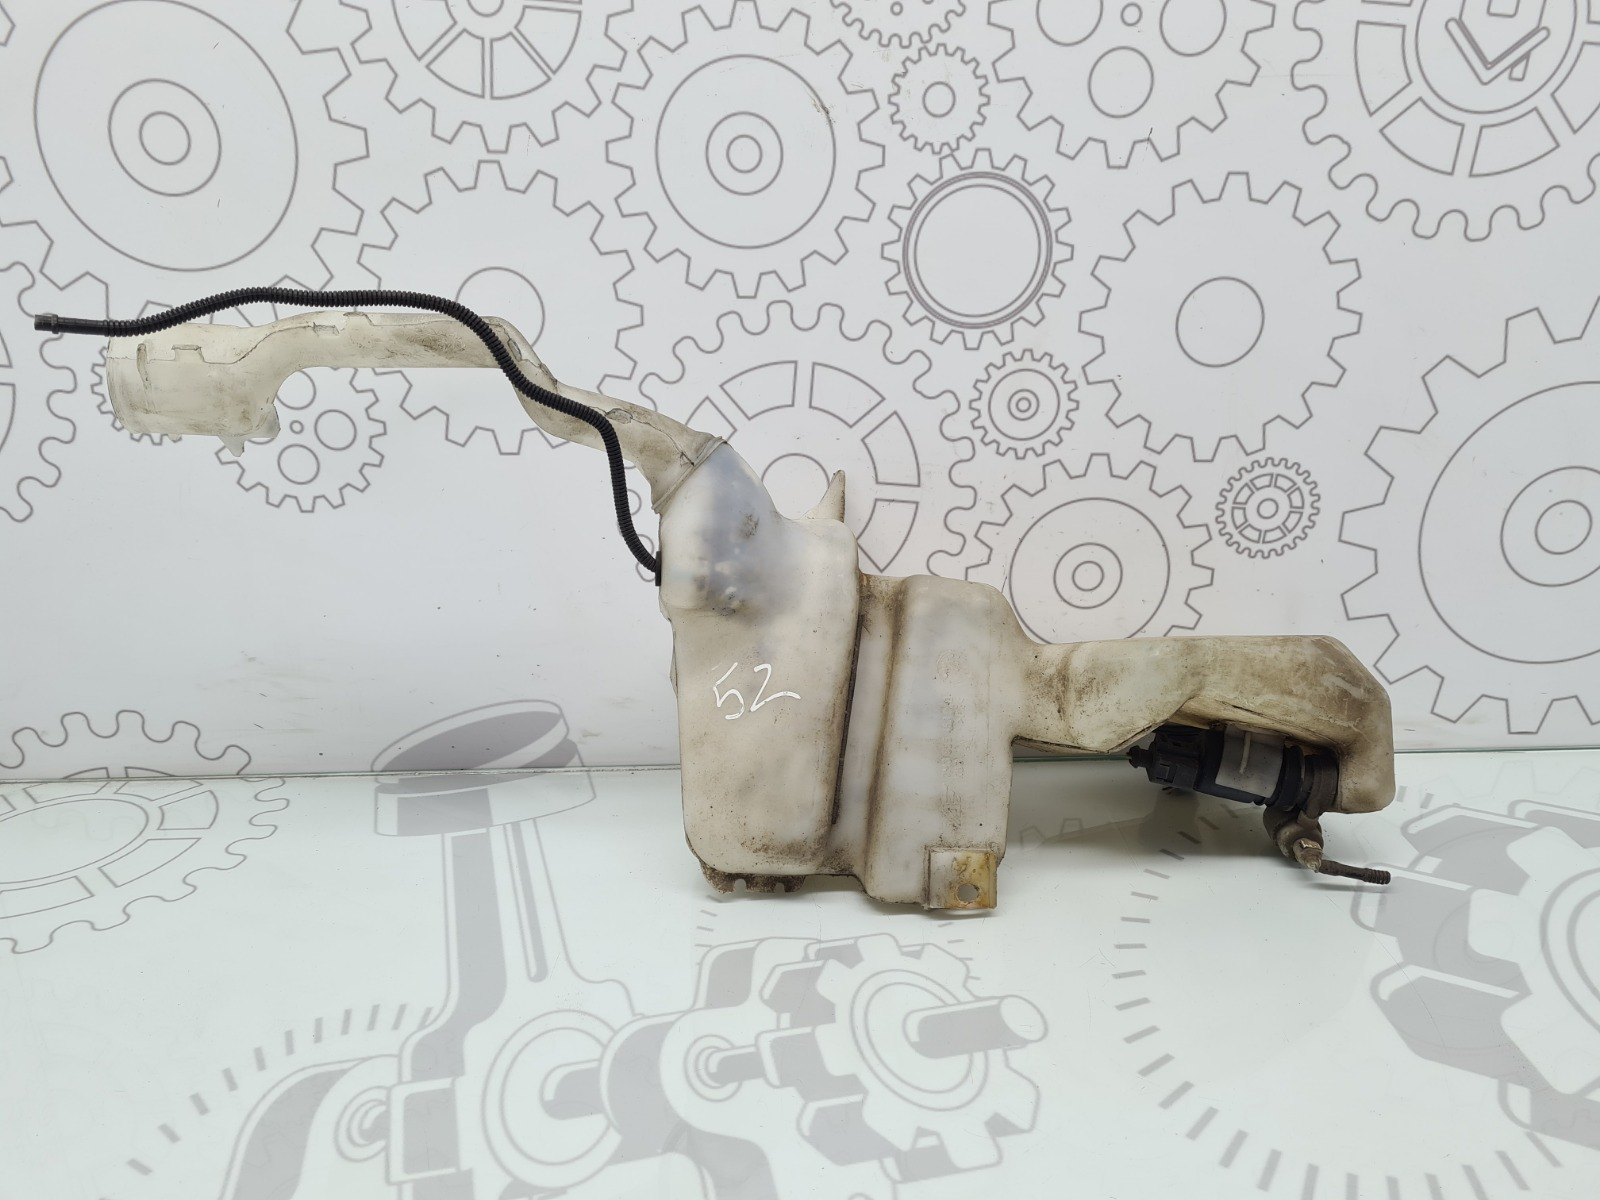 Бачок омывателя Seat Alhambra 2.0 TDI 2007 (б/у)